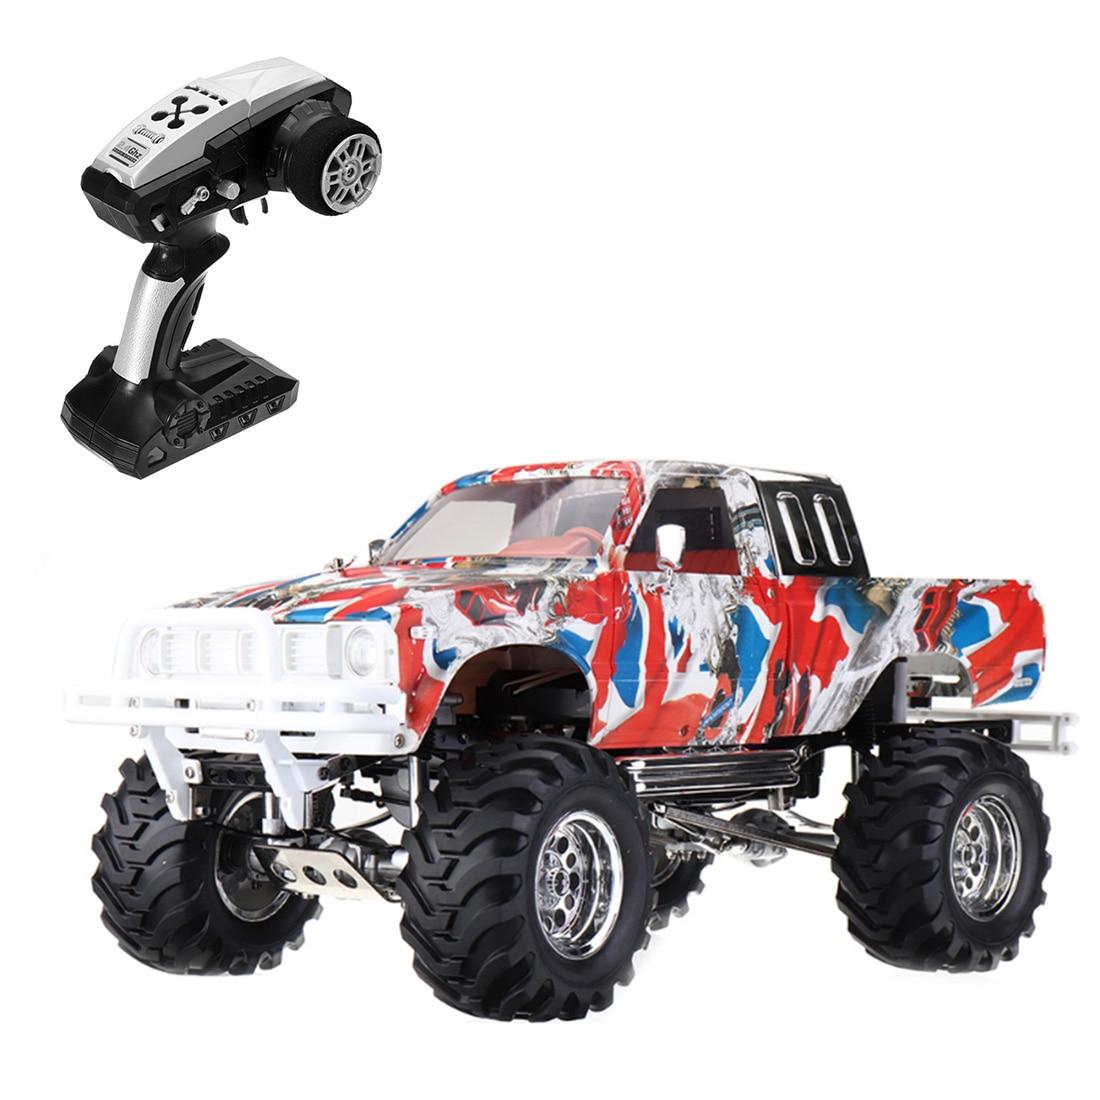 HG-P407 110 4WD 2,4G coche de Control remoto camioneta todoterreno para niños juguetes educativos-negro EU US Plug Graffiti Edition